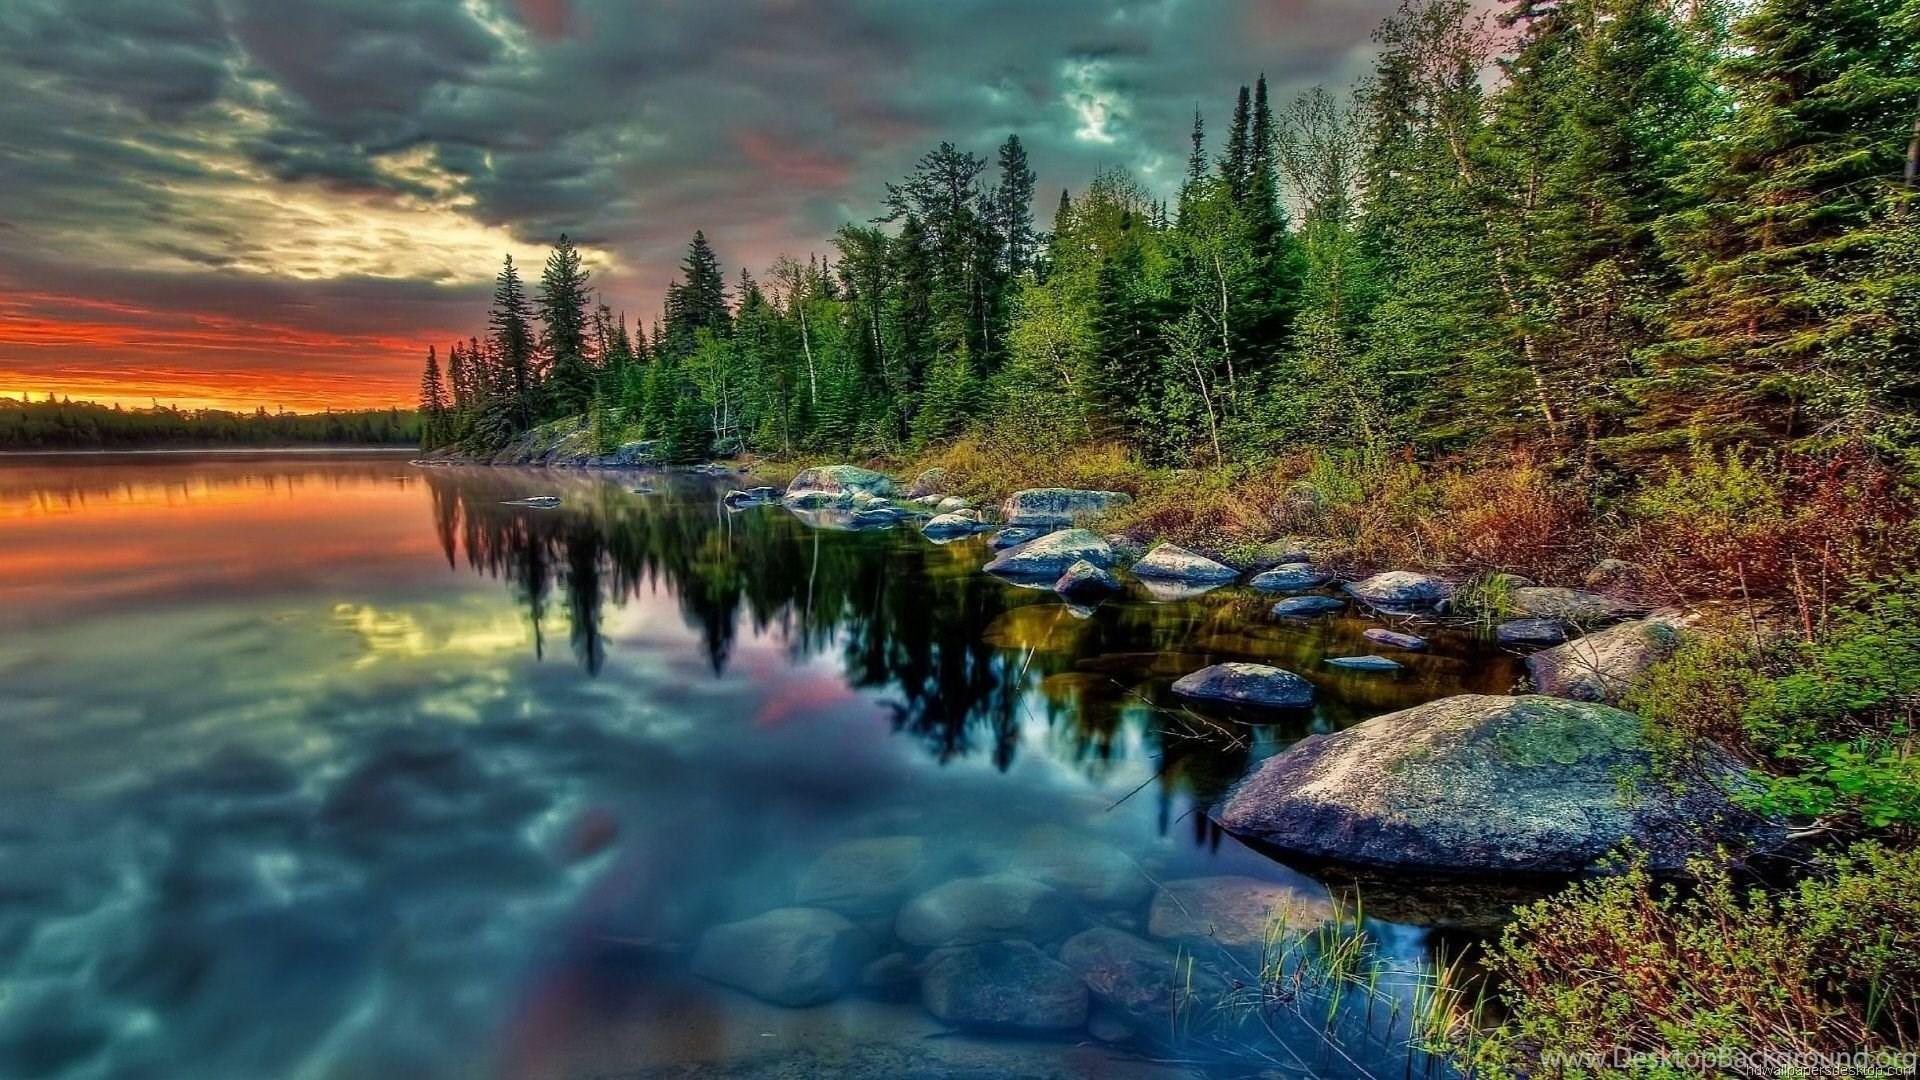 Hd Nature Wallpapers For Desktop Latest Wallpapers Desktop Background